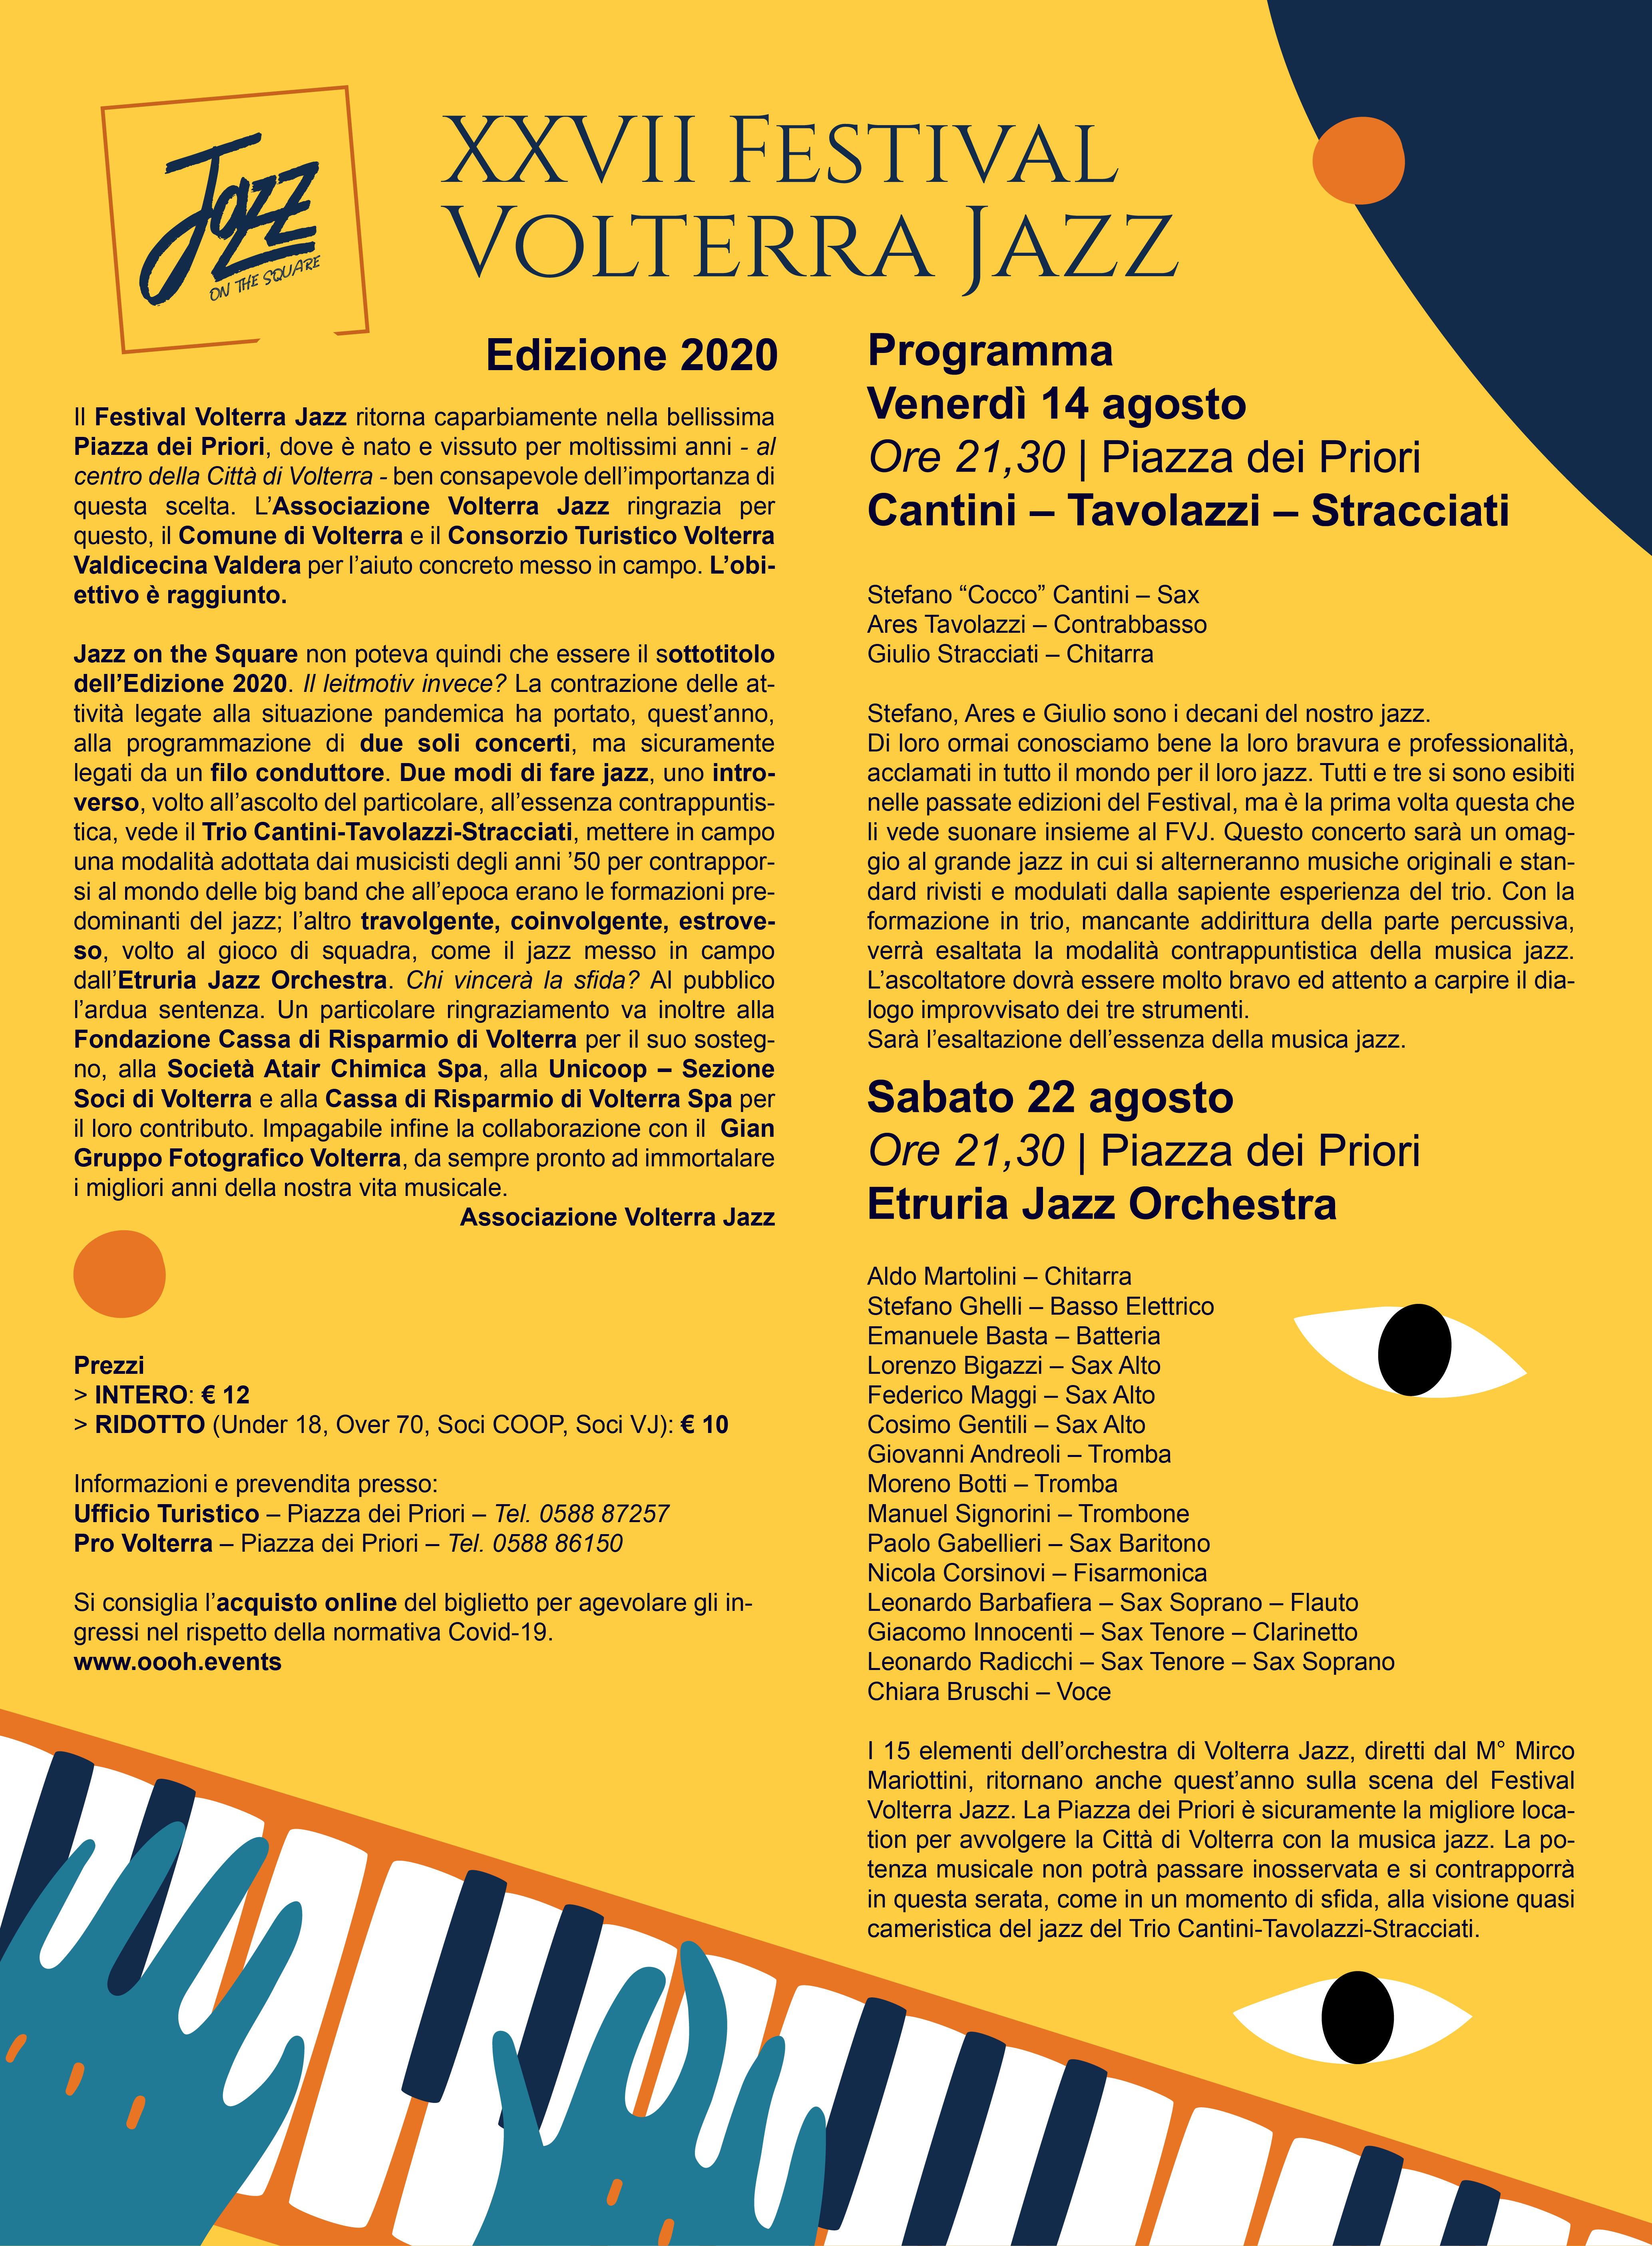 festival-volterra-jazz-2020-retro